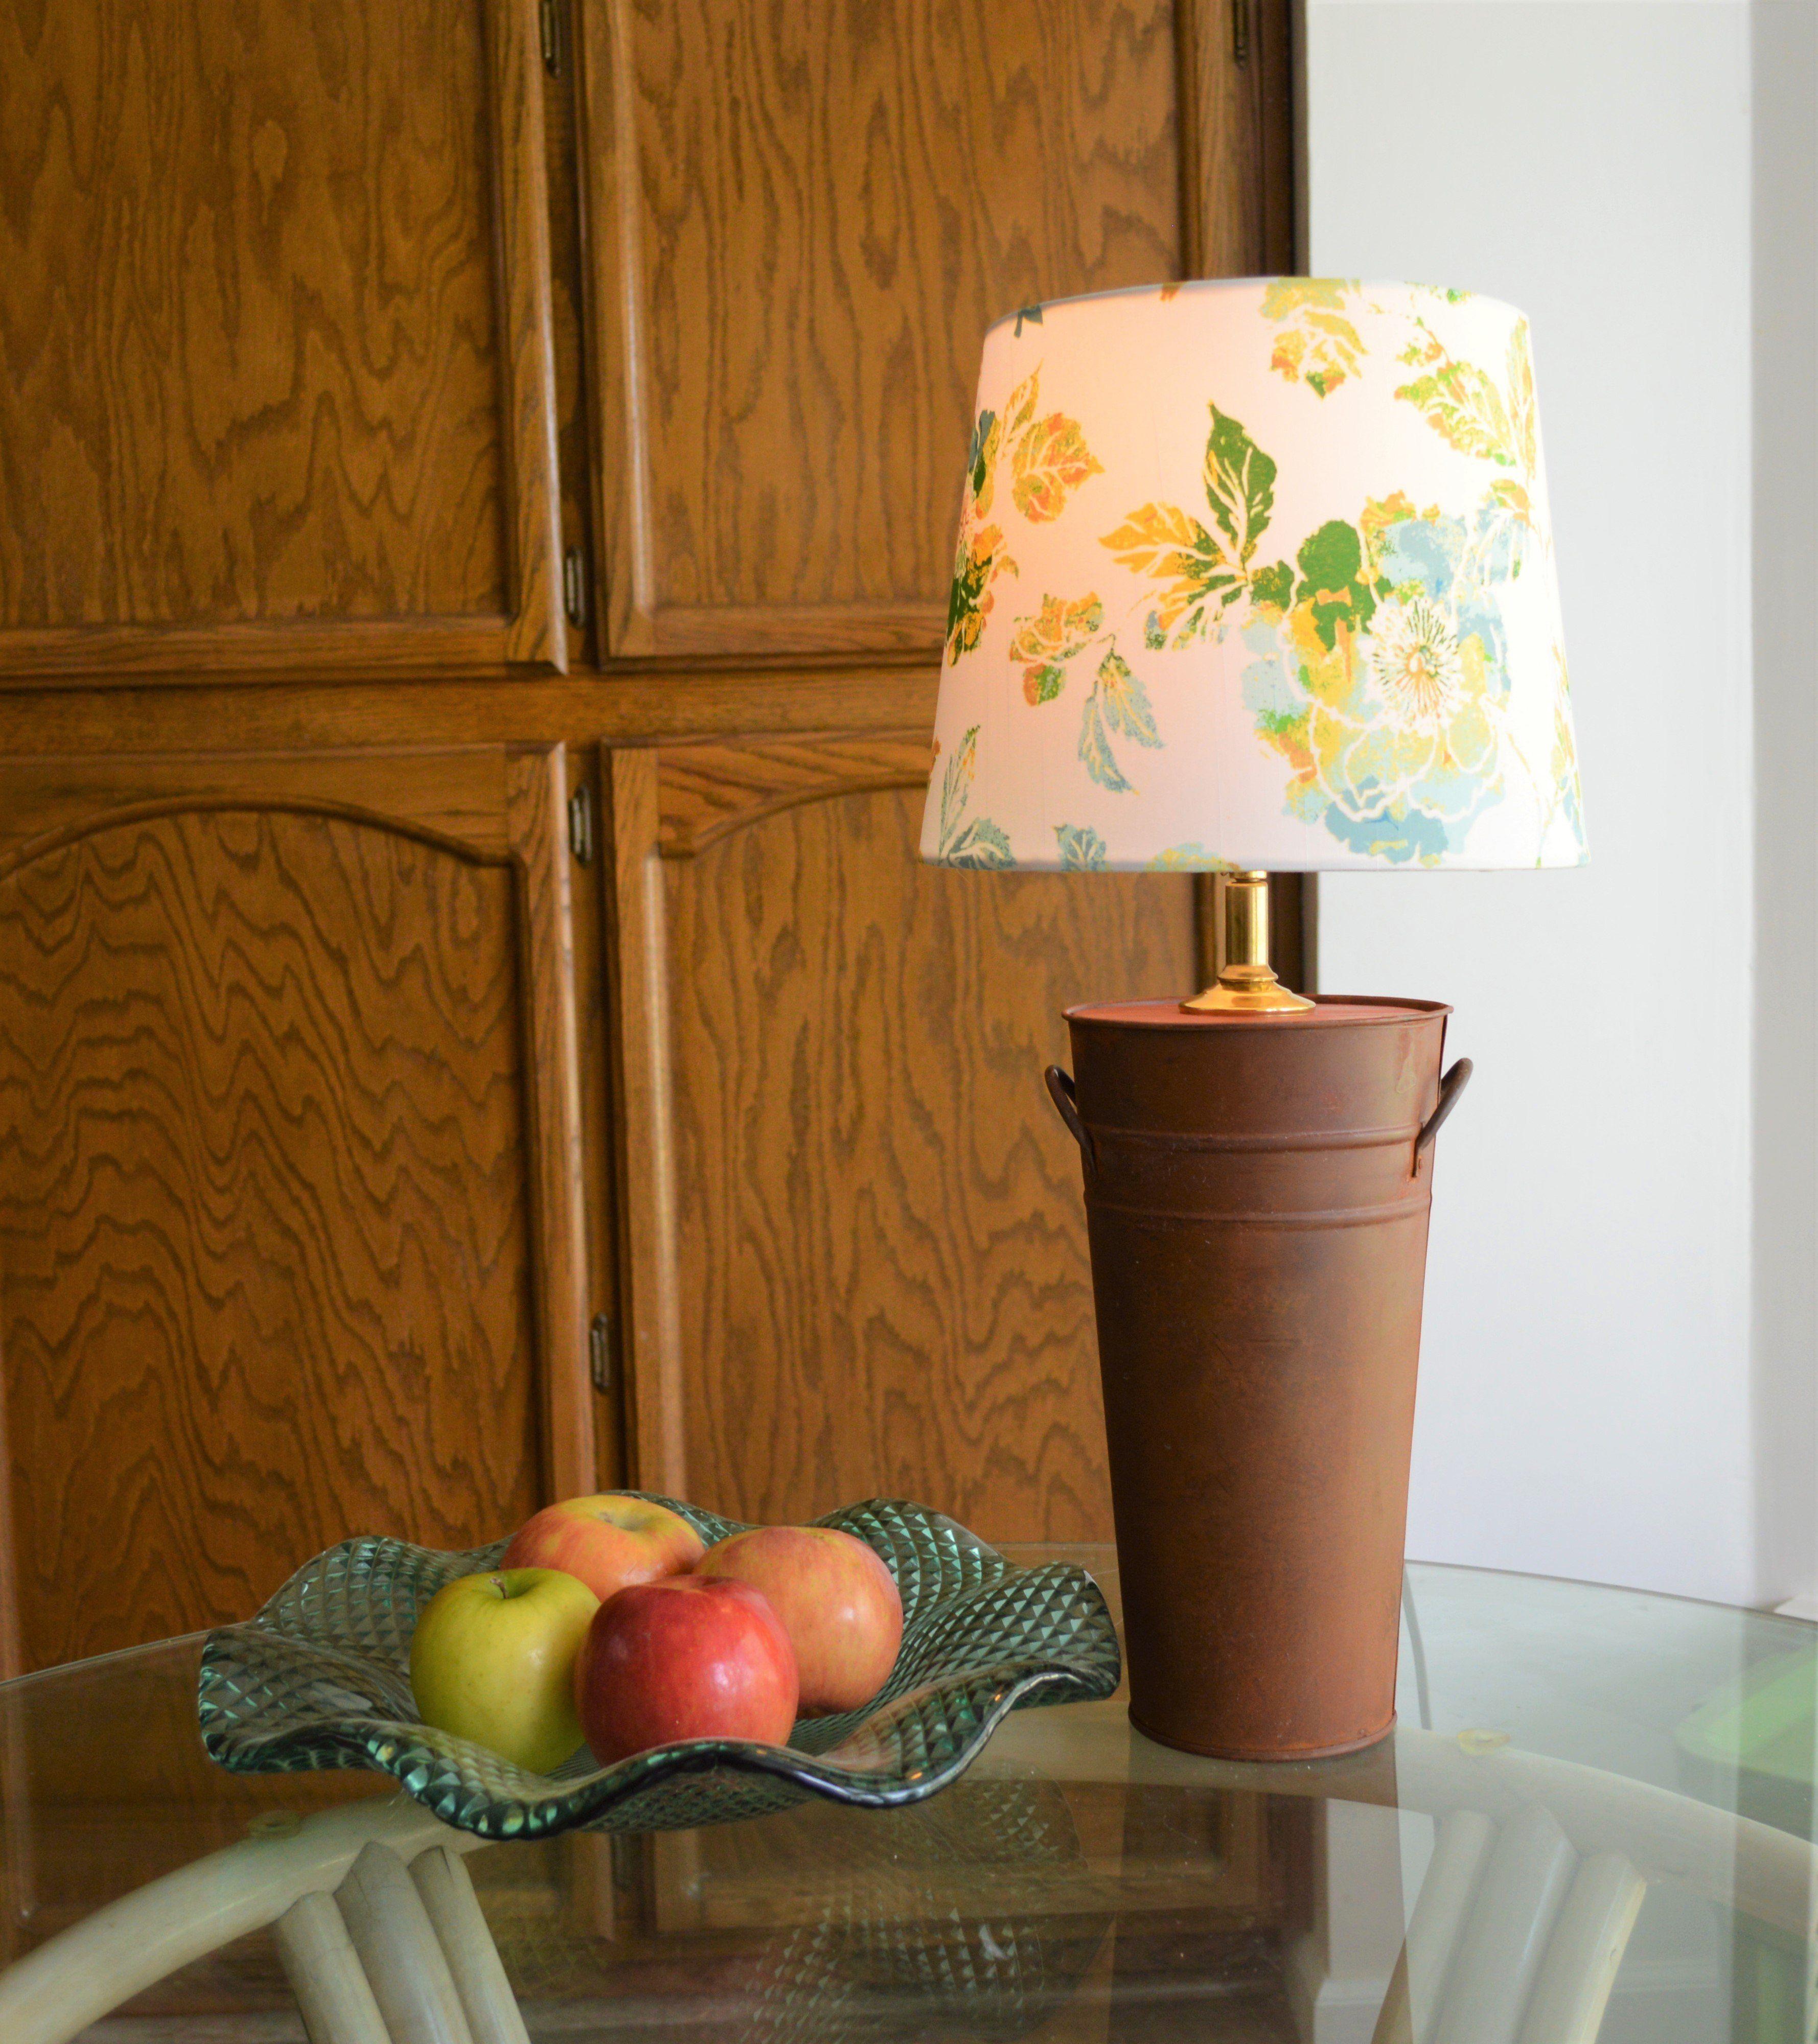 Farmhouse decor metal base table lamp with floral fabric shade farmhouse decor metal base table lamp with floral fabric shade geotapseo Image collections